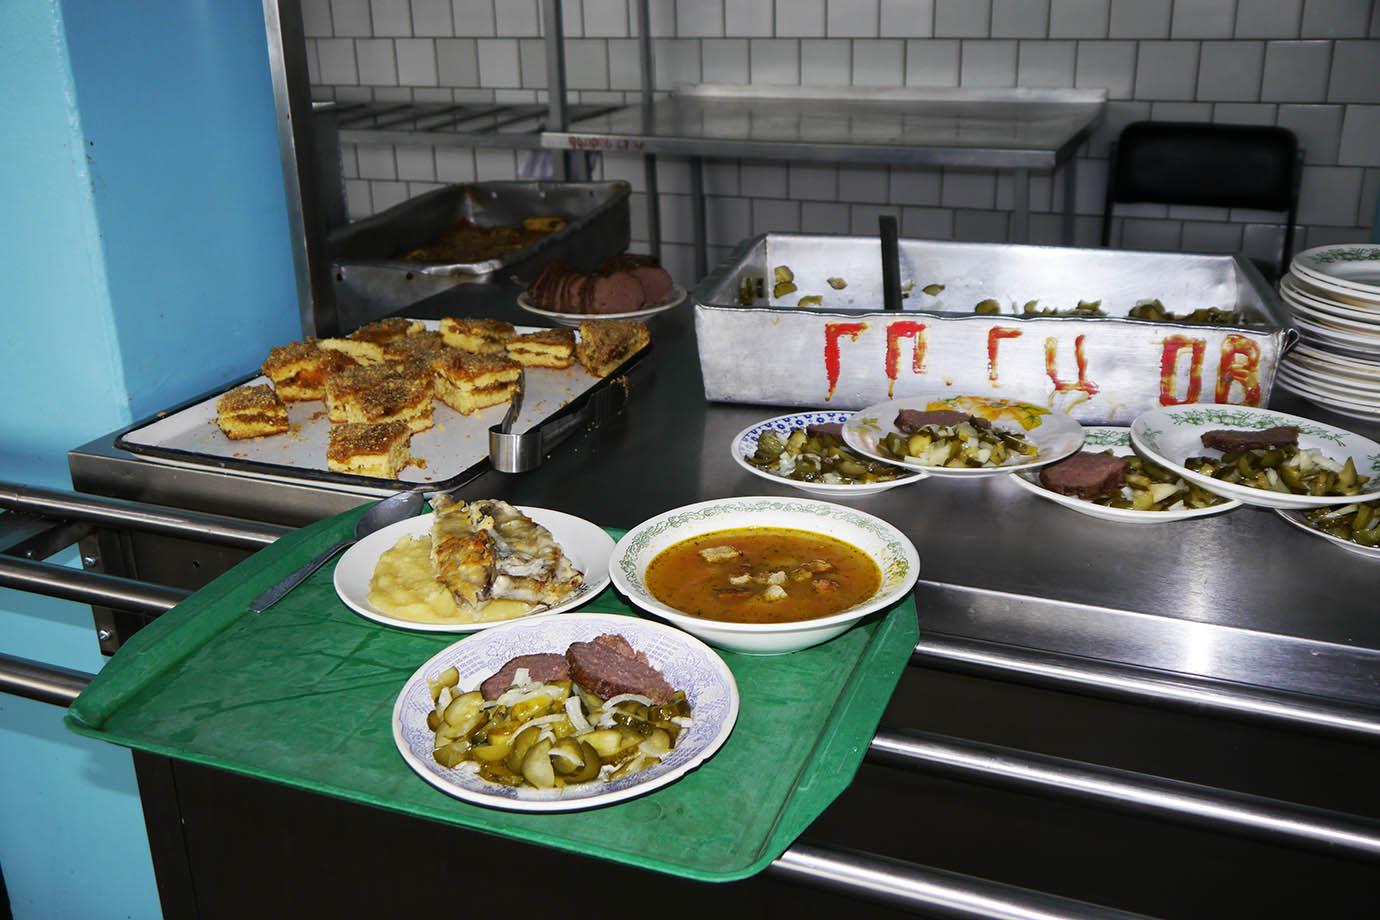 chernobyl-cafeteria36